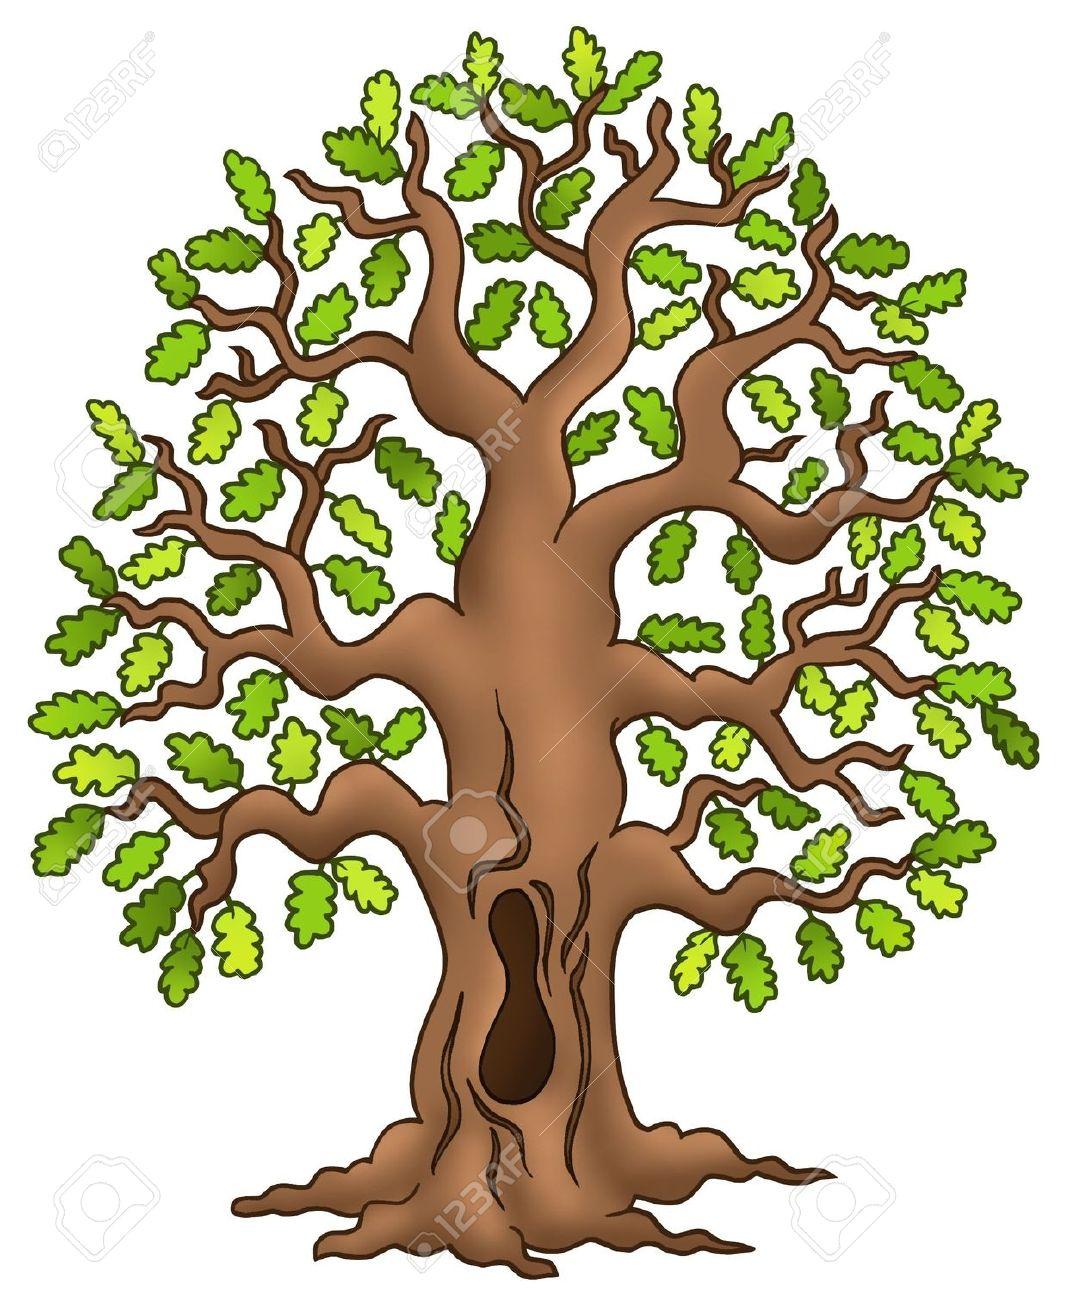 Oak Tree Forest Clipart Backgrounds.